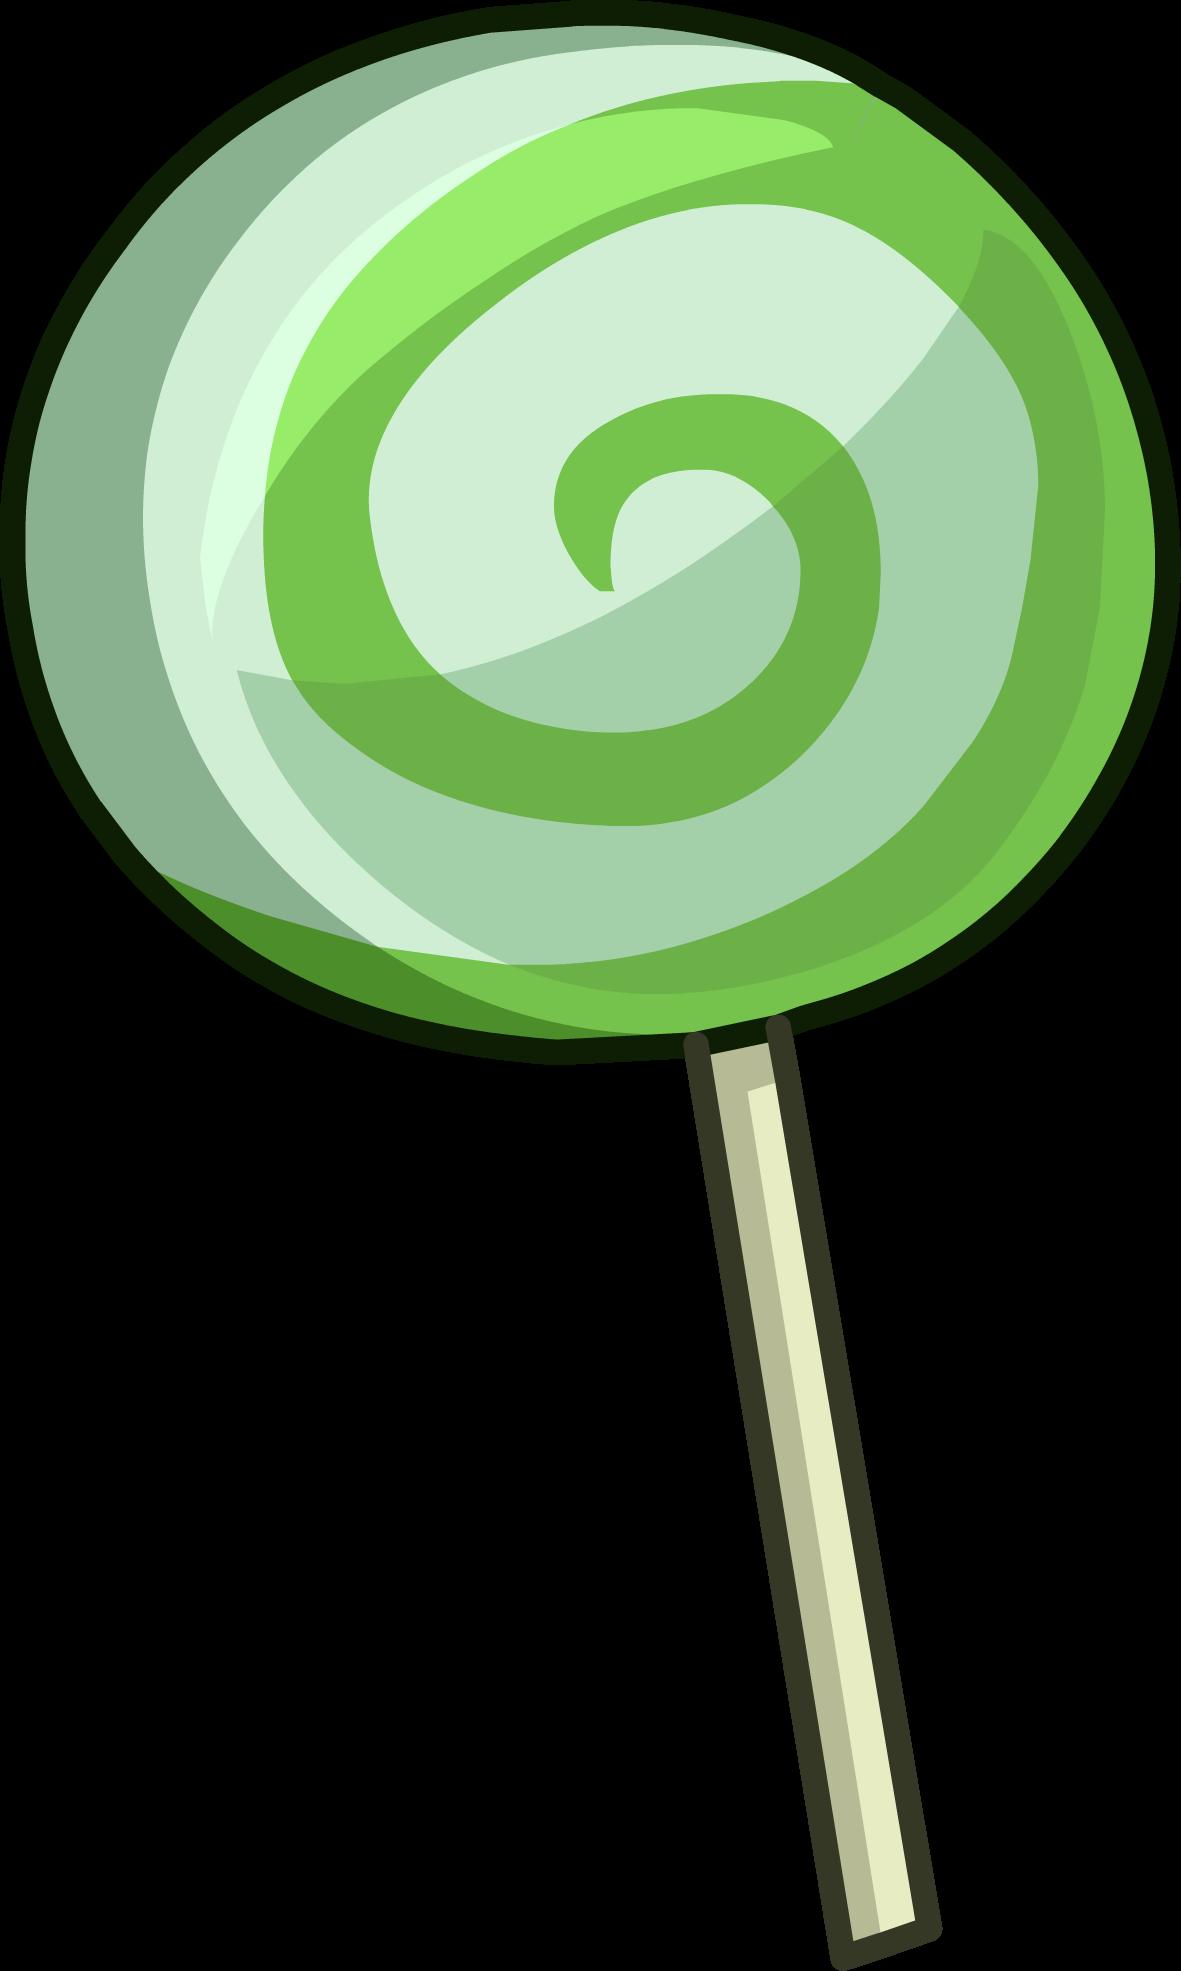 clipart freeuse stock Lollipop Clipart green